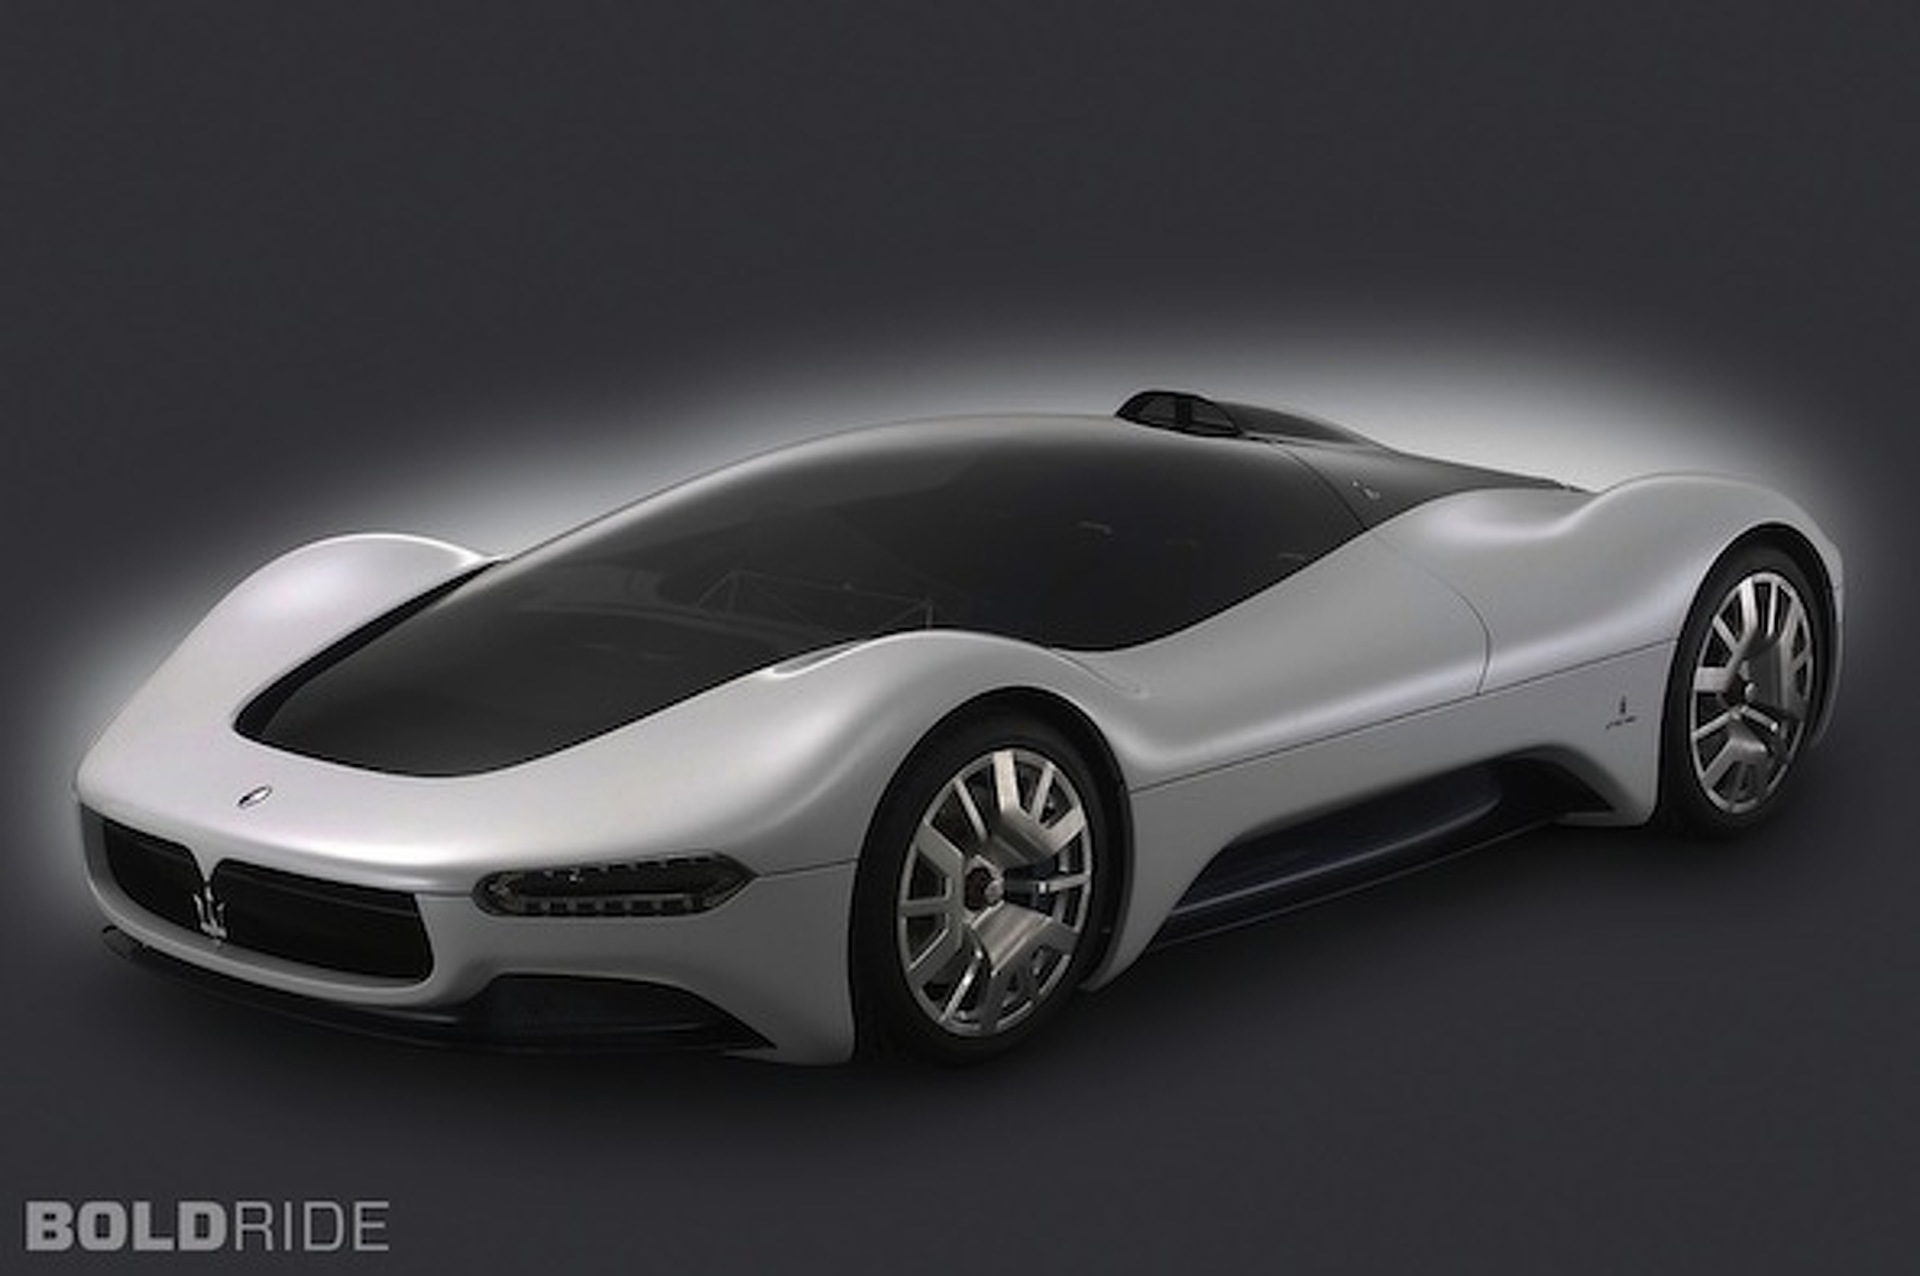 Maserati Birdcage Concept: A Tribute to Italian Ingenuity